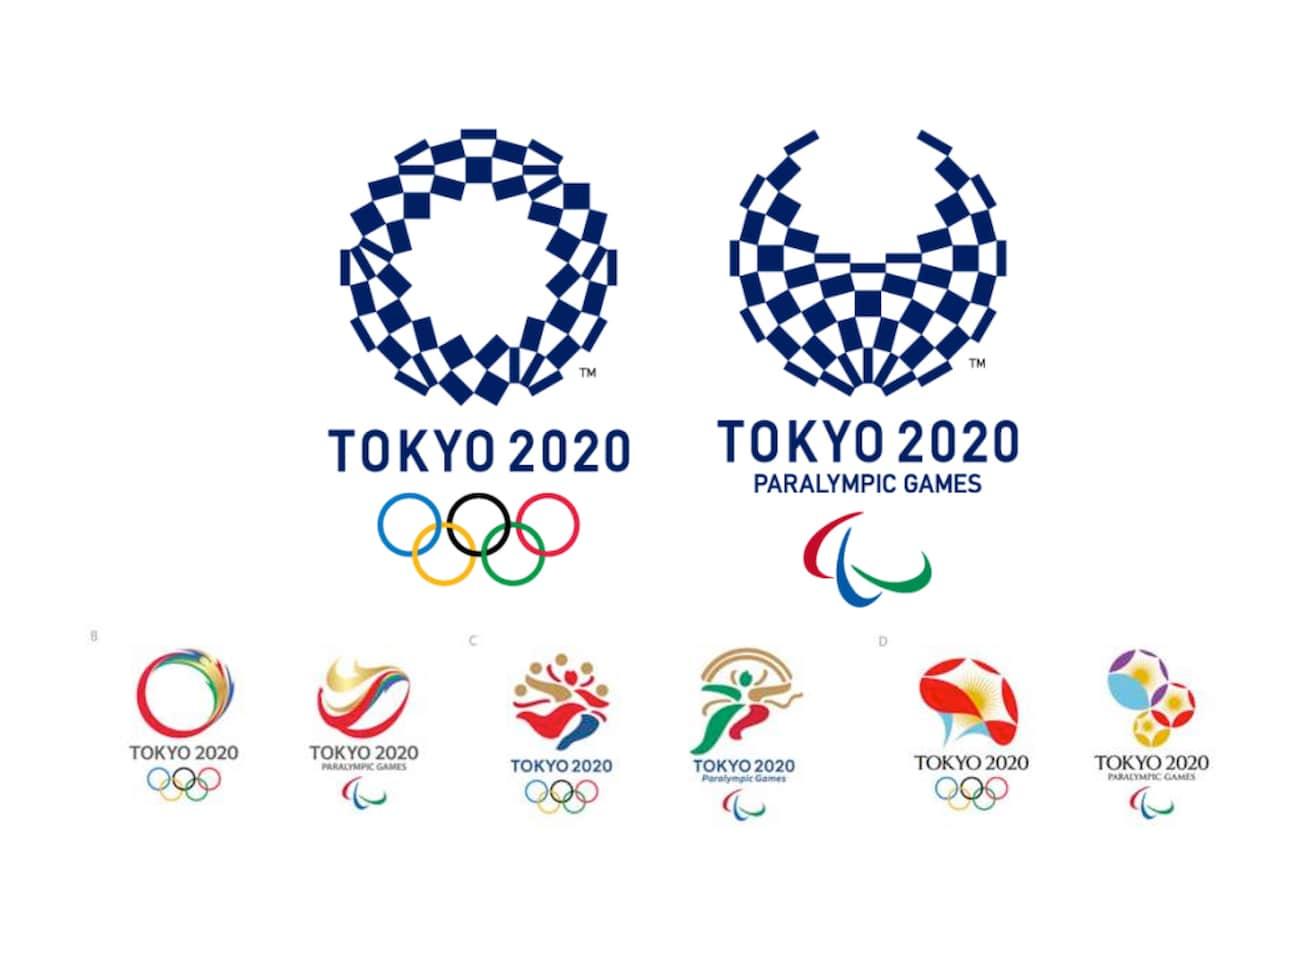 Le logo définitif de Tokyo 2020